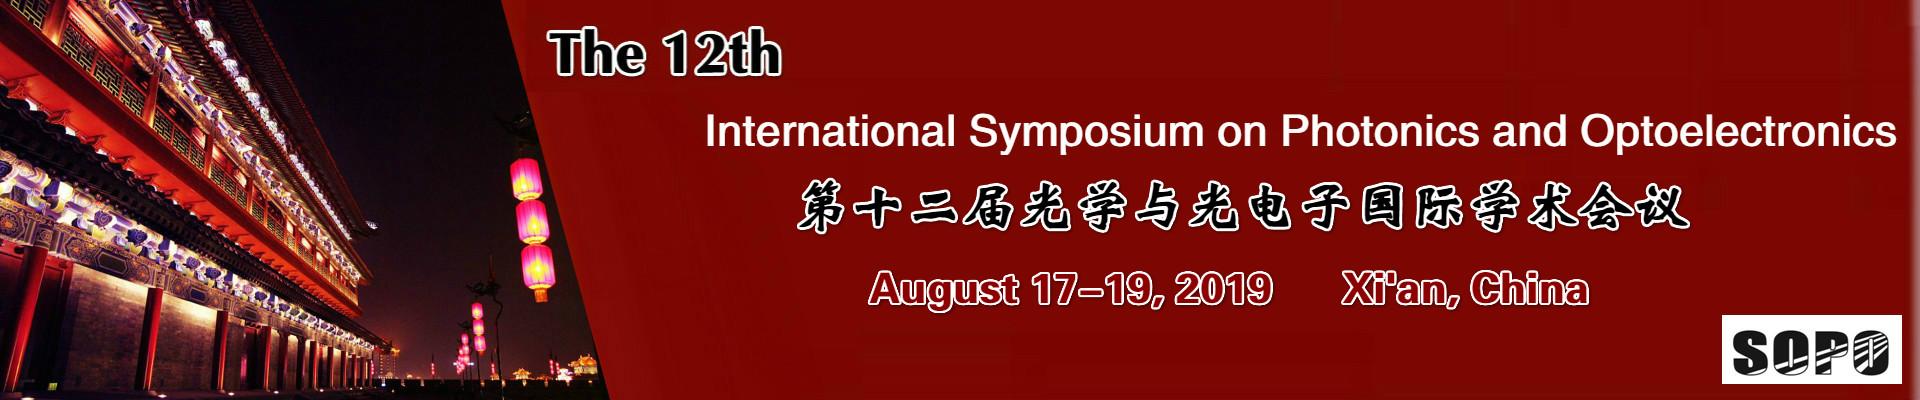 The 12th International Symposium on Photonics and Optoelectronics (SOPO 2019), Xi'an, Shaanxi, China